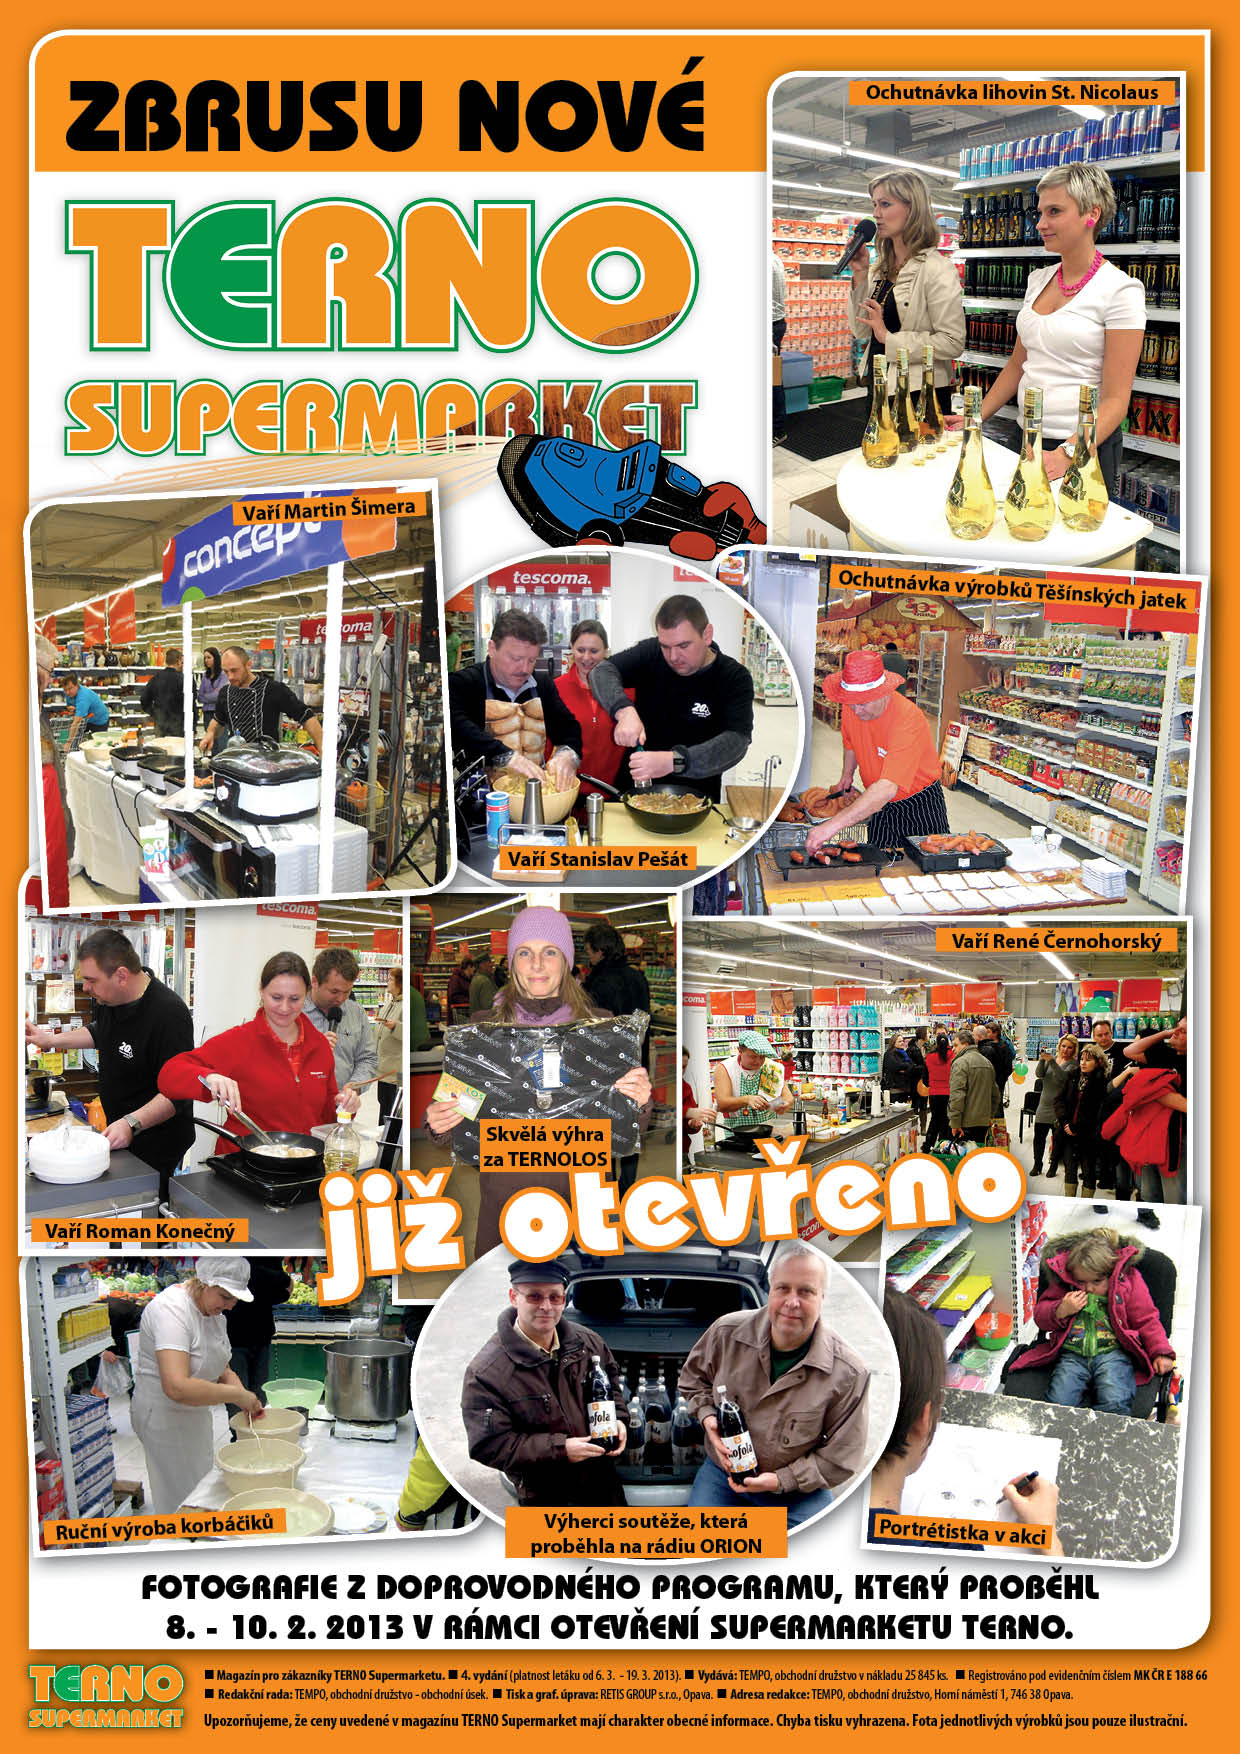 Zbrusu nový supermarket TERNO!